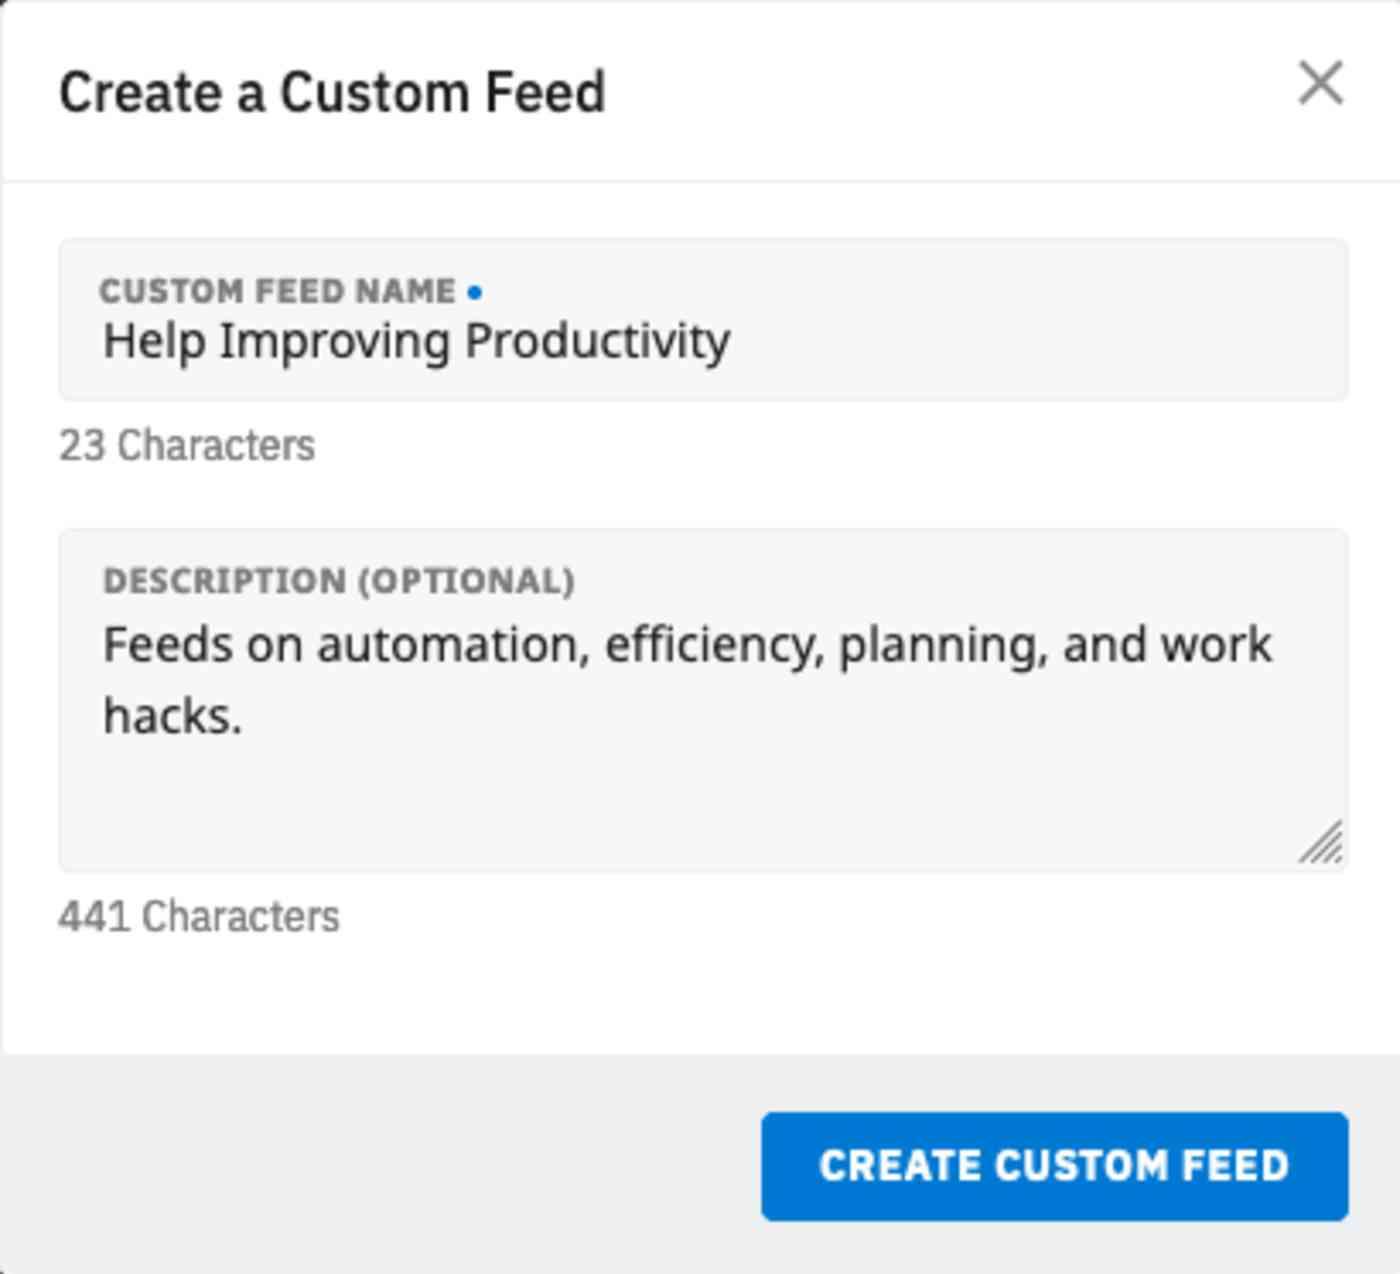 Describing custom feed